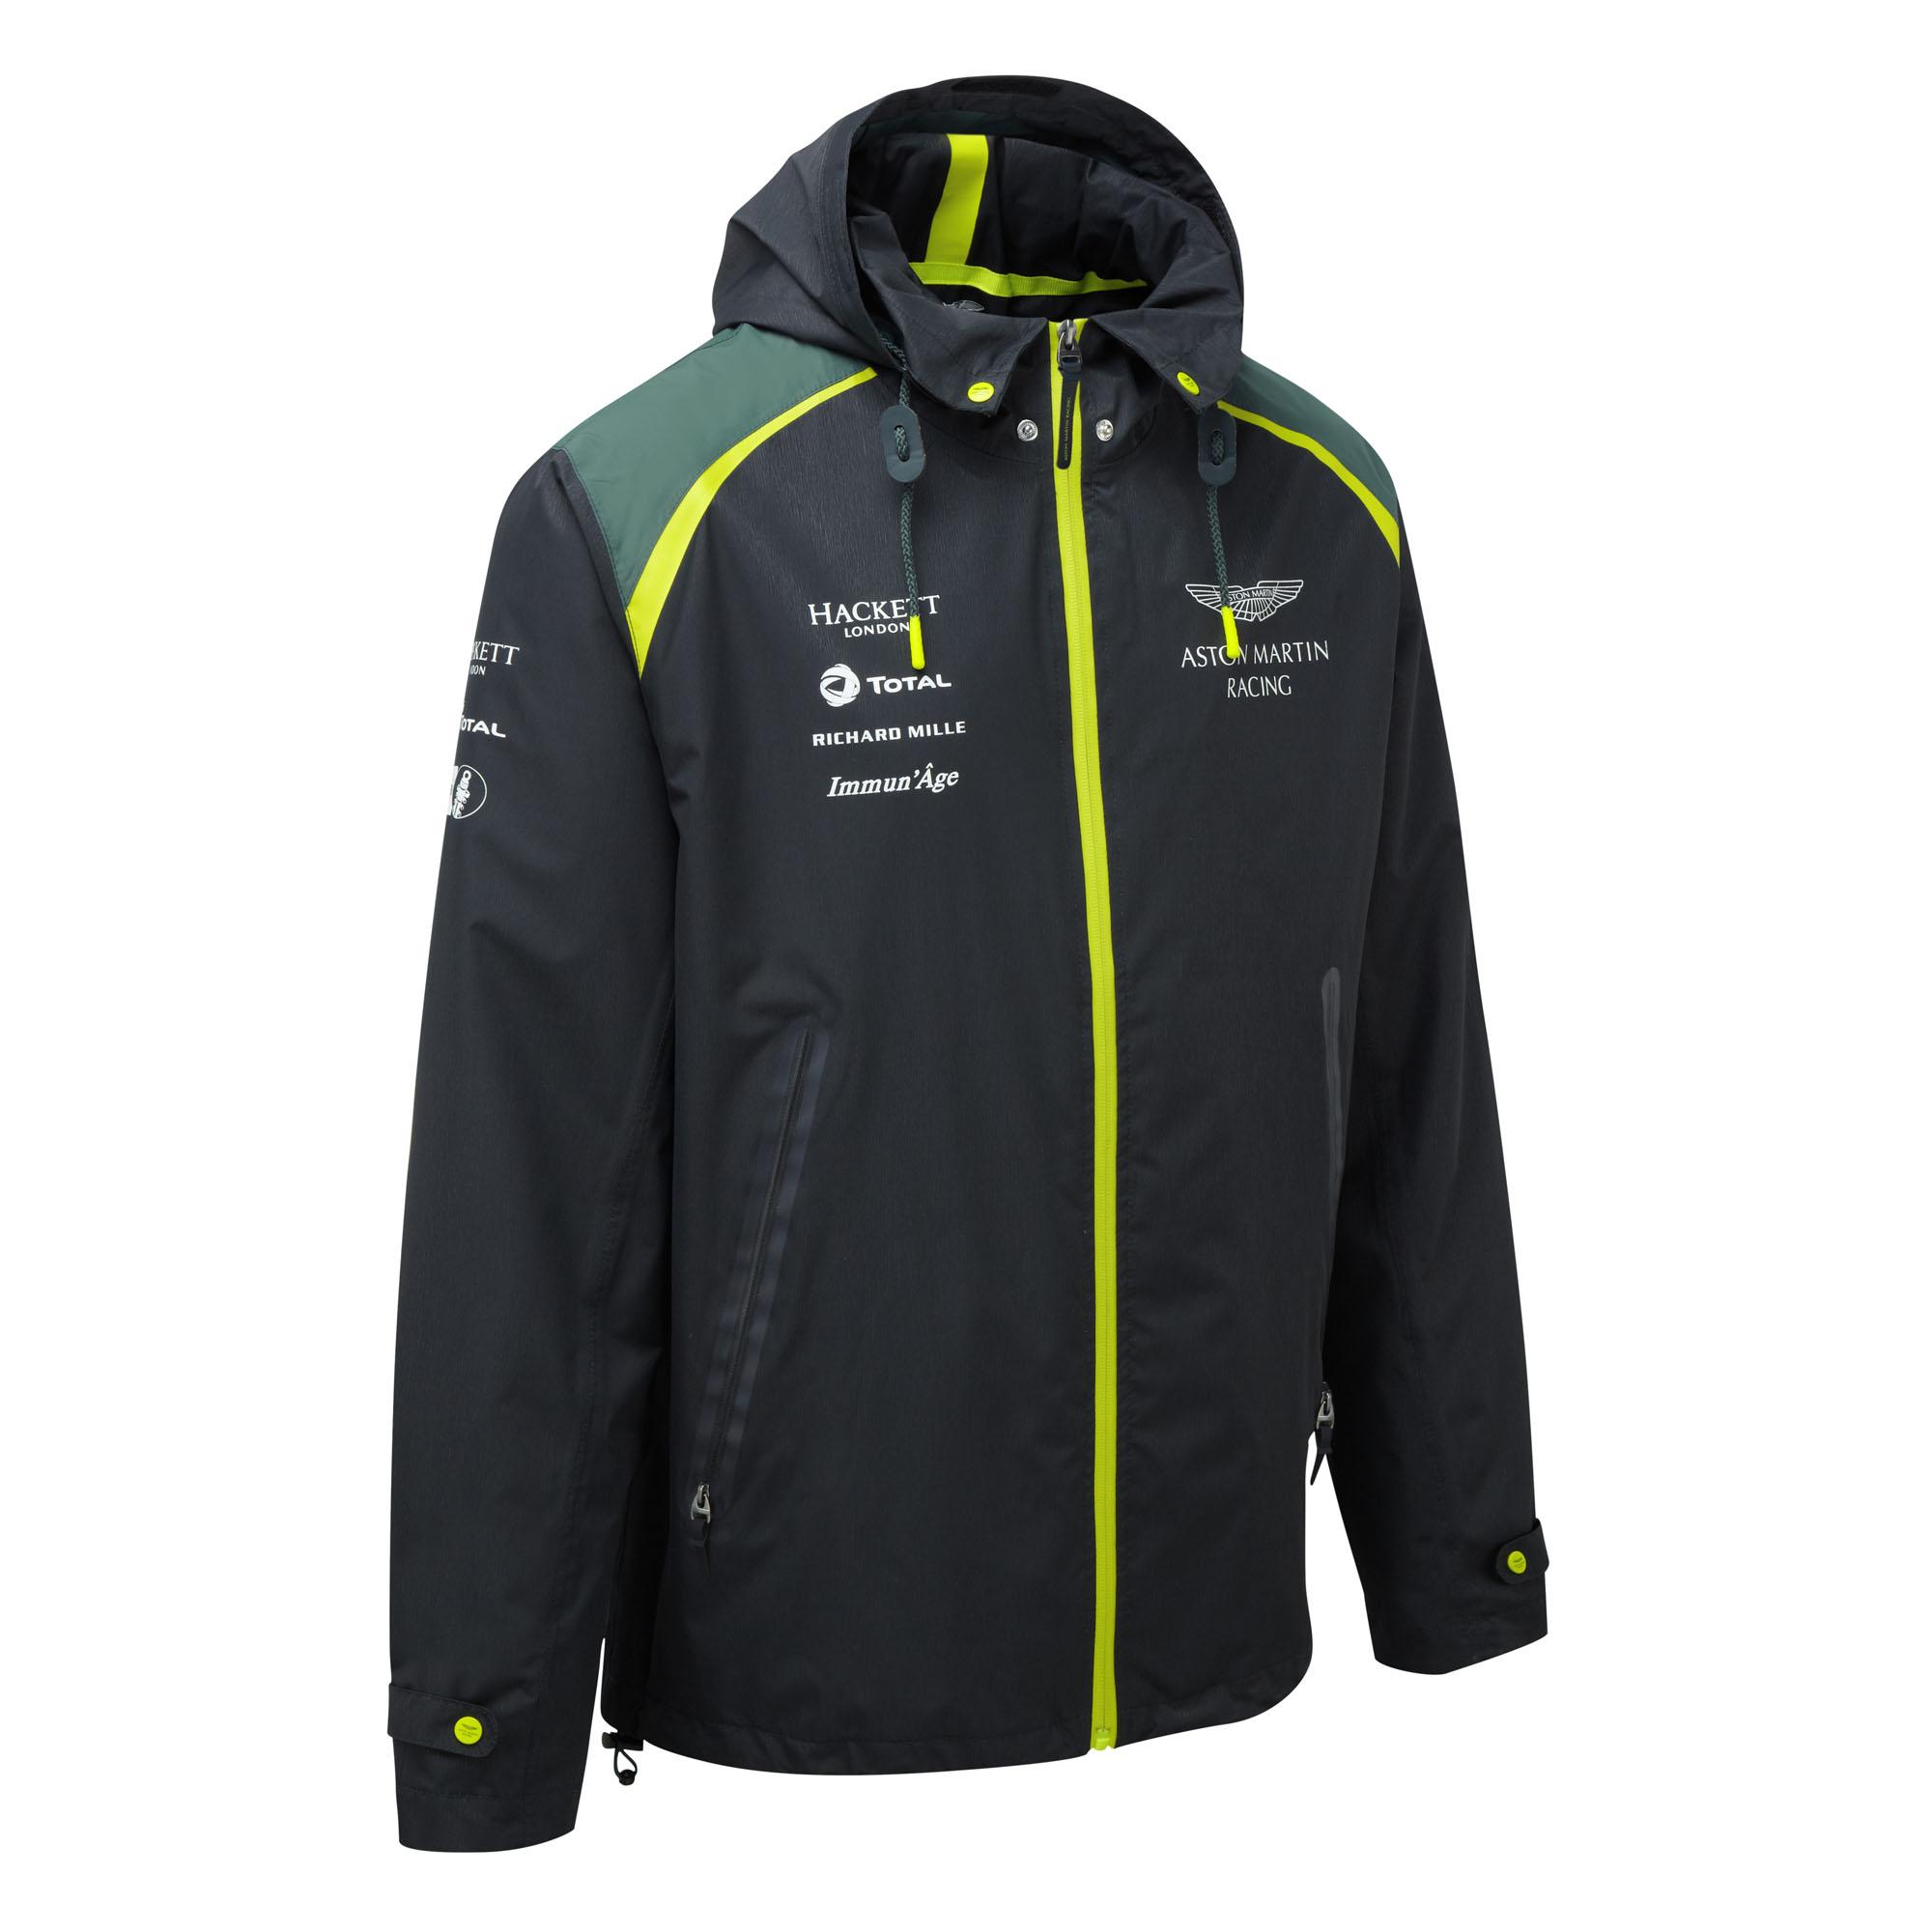 Sale! 2017 Aston Martin Racing Team Mens Lightweight